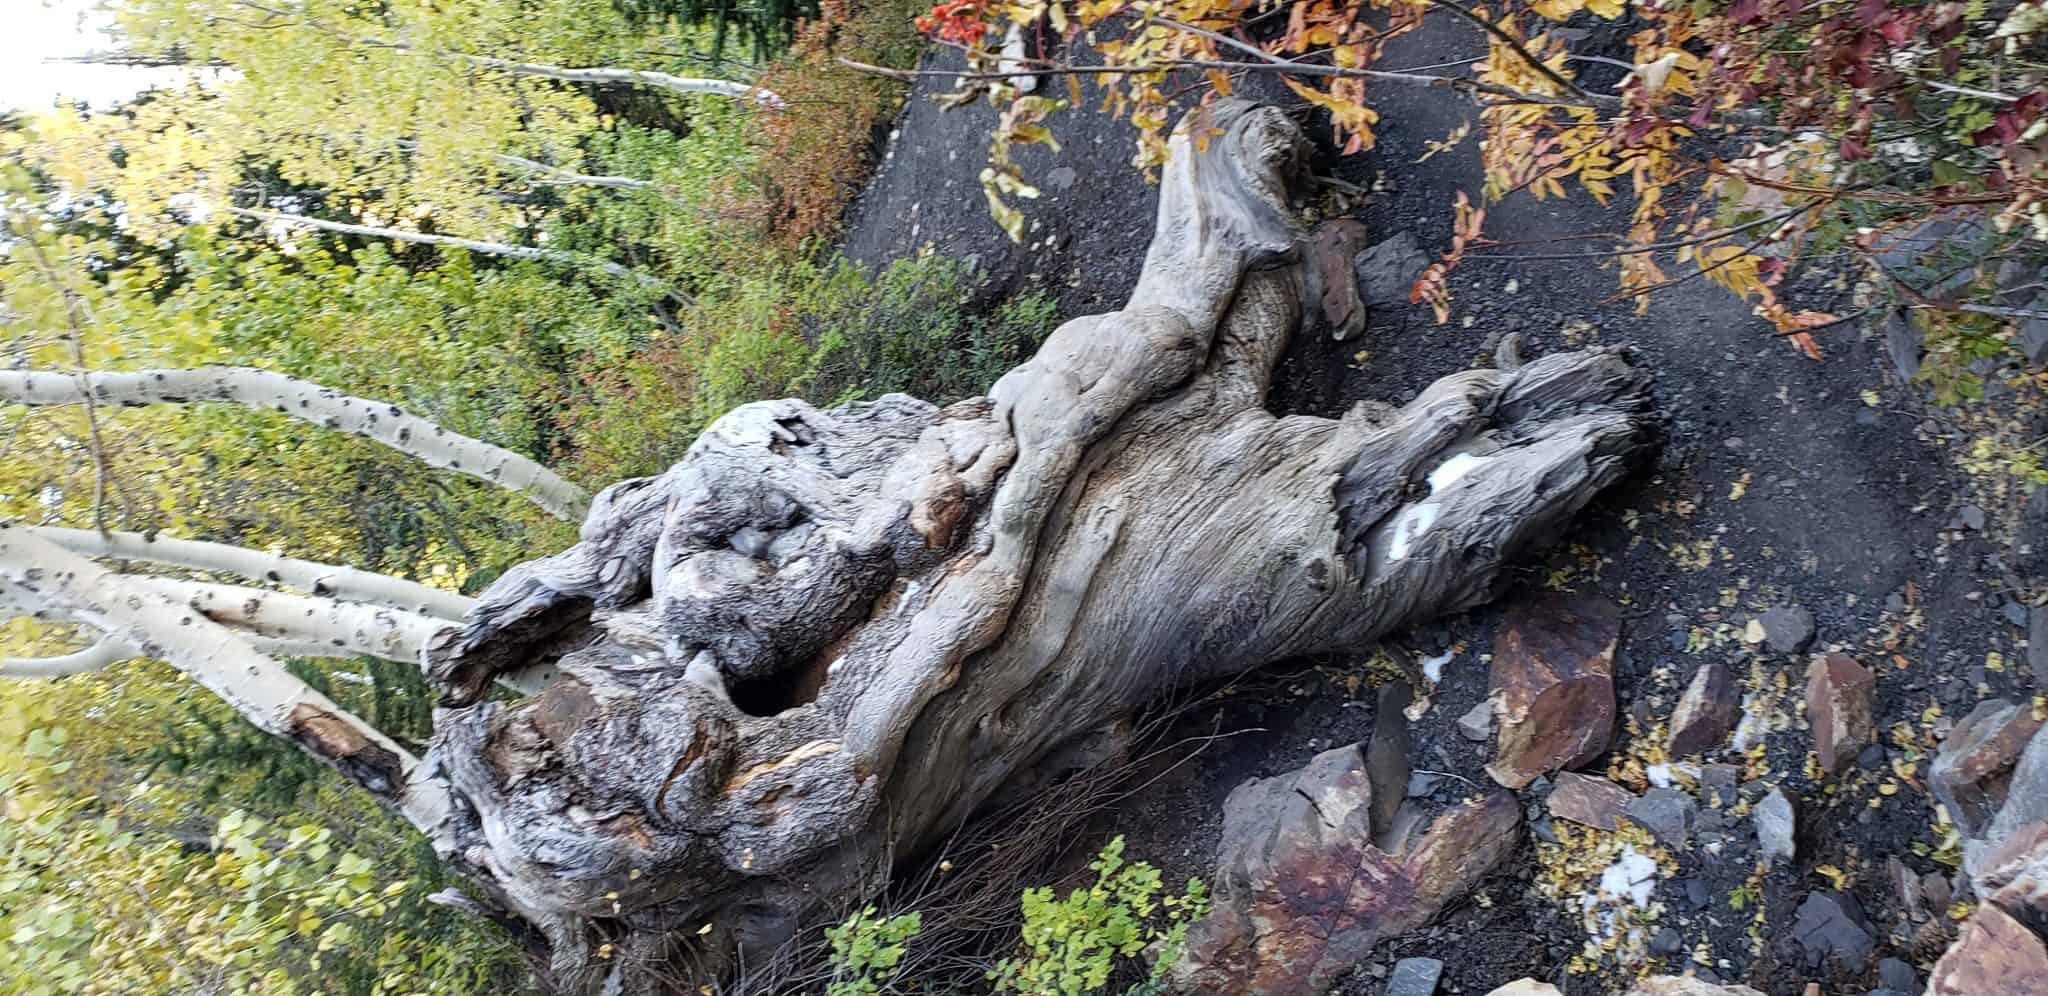 Cool old log up Big Cottonwood Canyon on Lake Blanche Trail